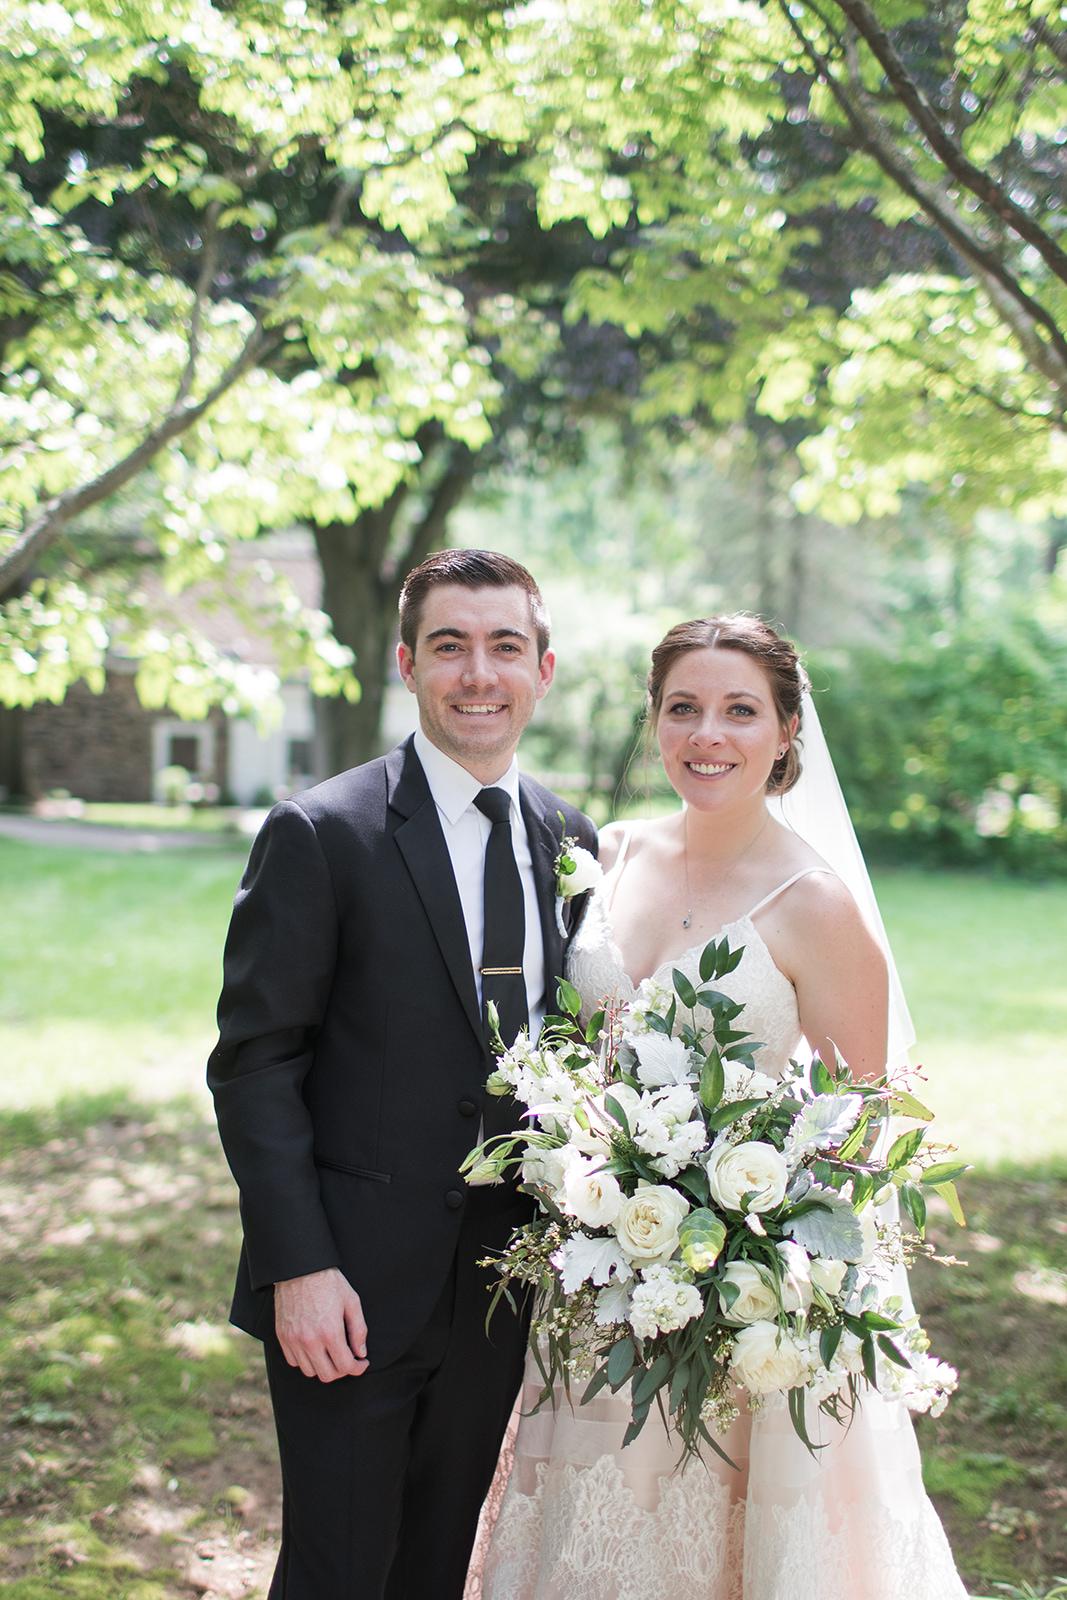 Christa & Jay | Appleford Estate Wedding